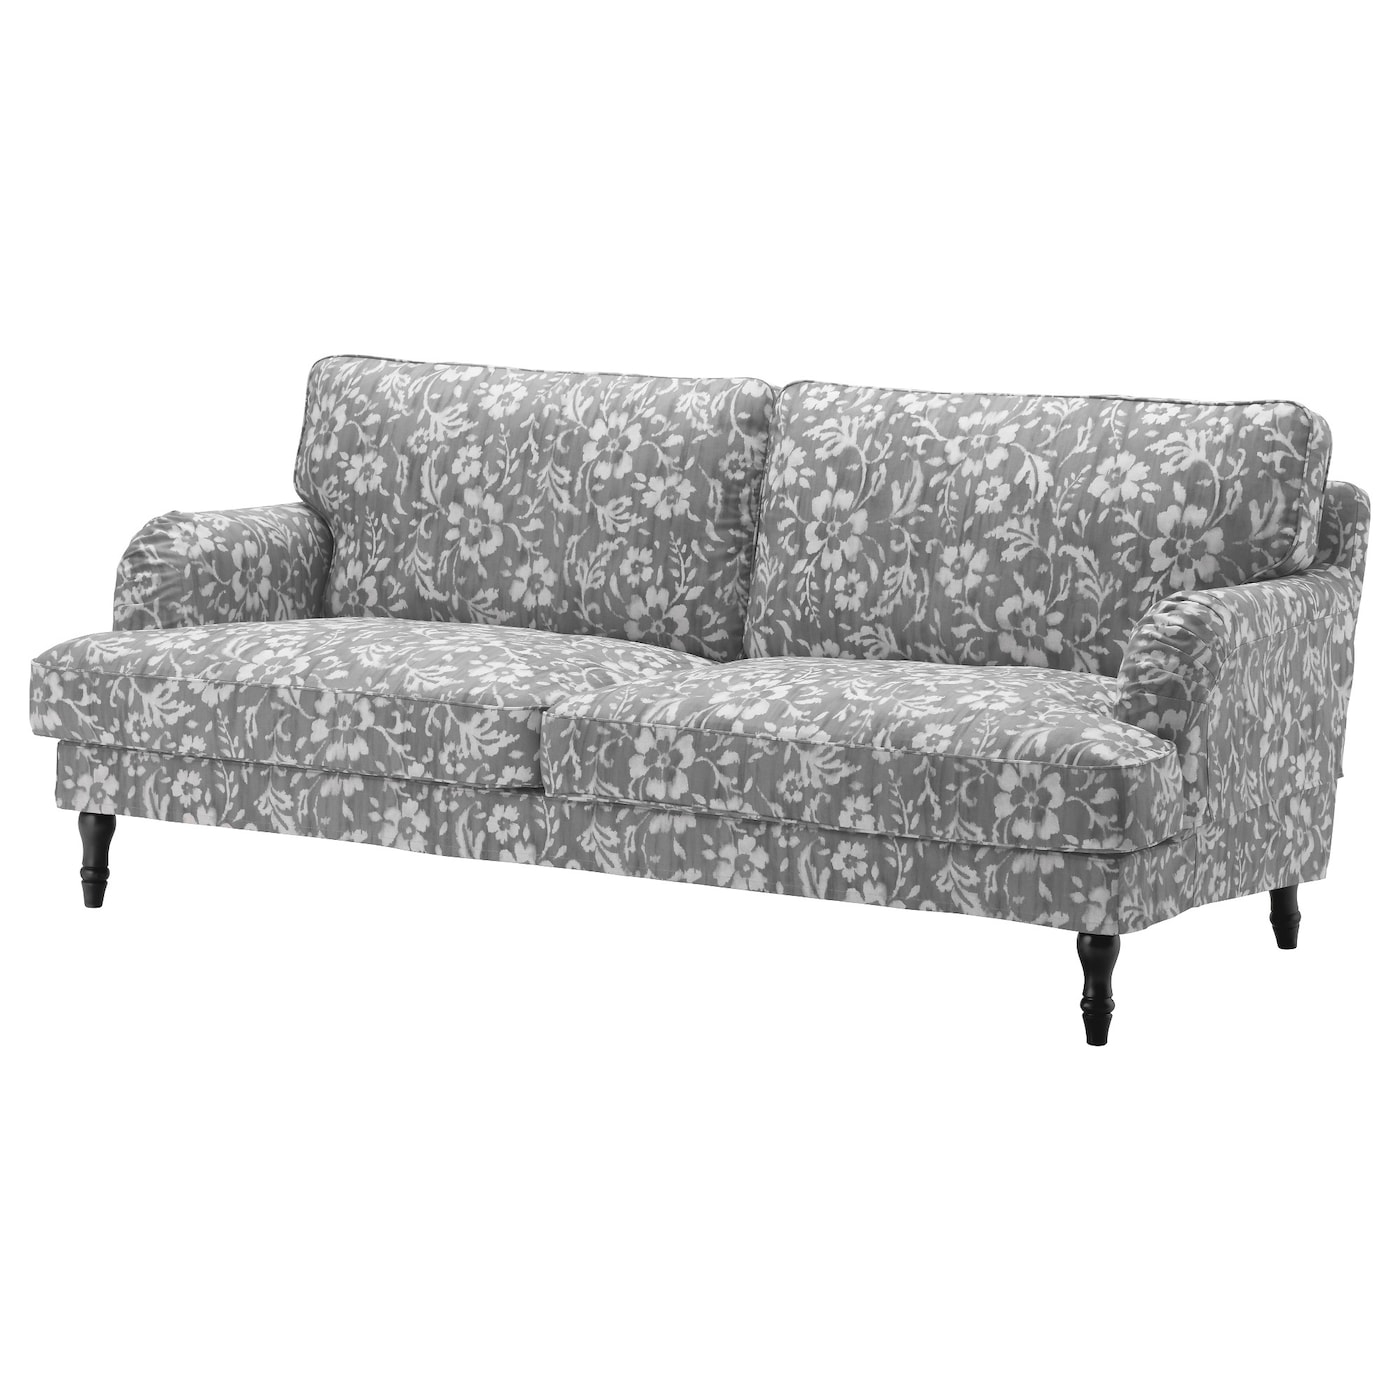 Stocksund three seat sofa hovsten grey white black wood ikea for Sofa und seat